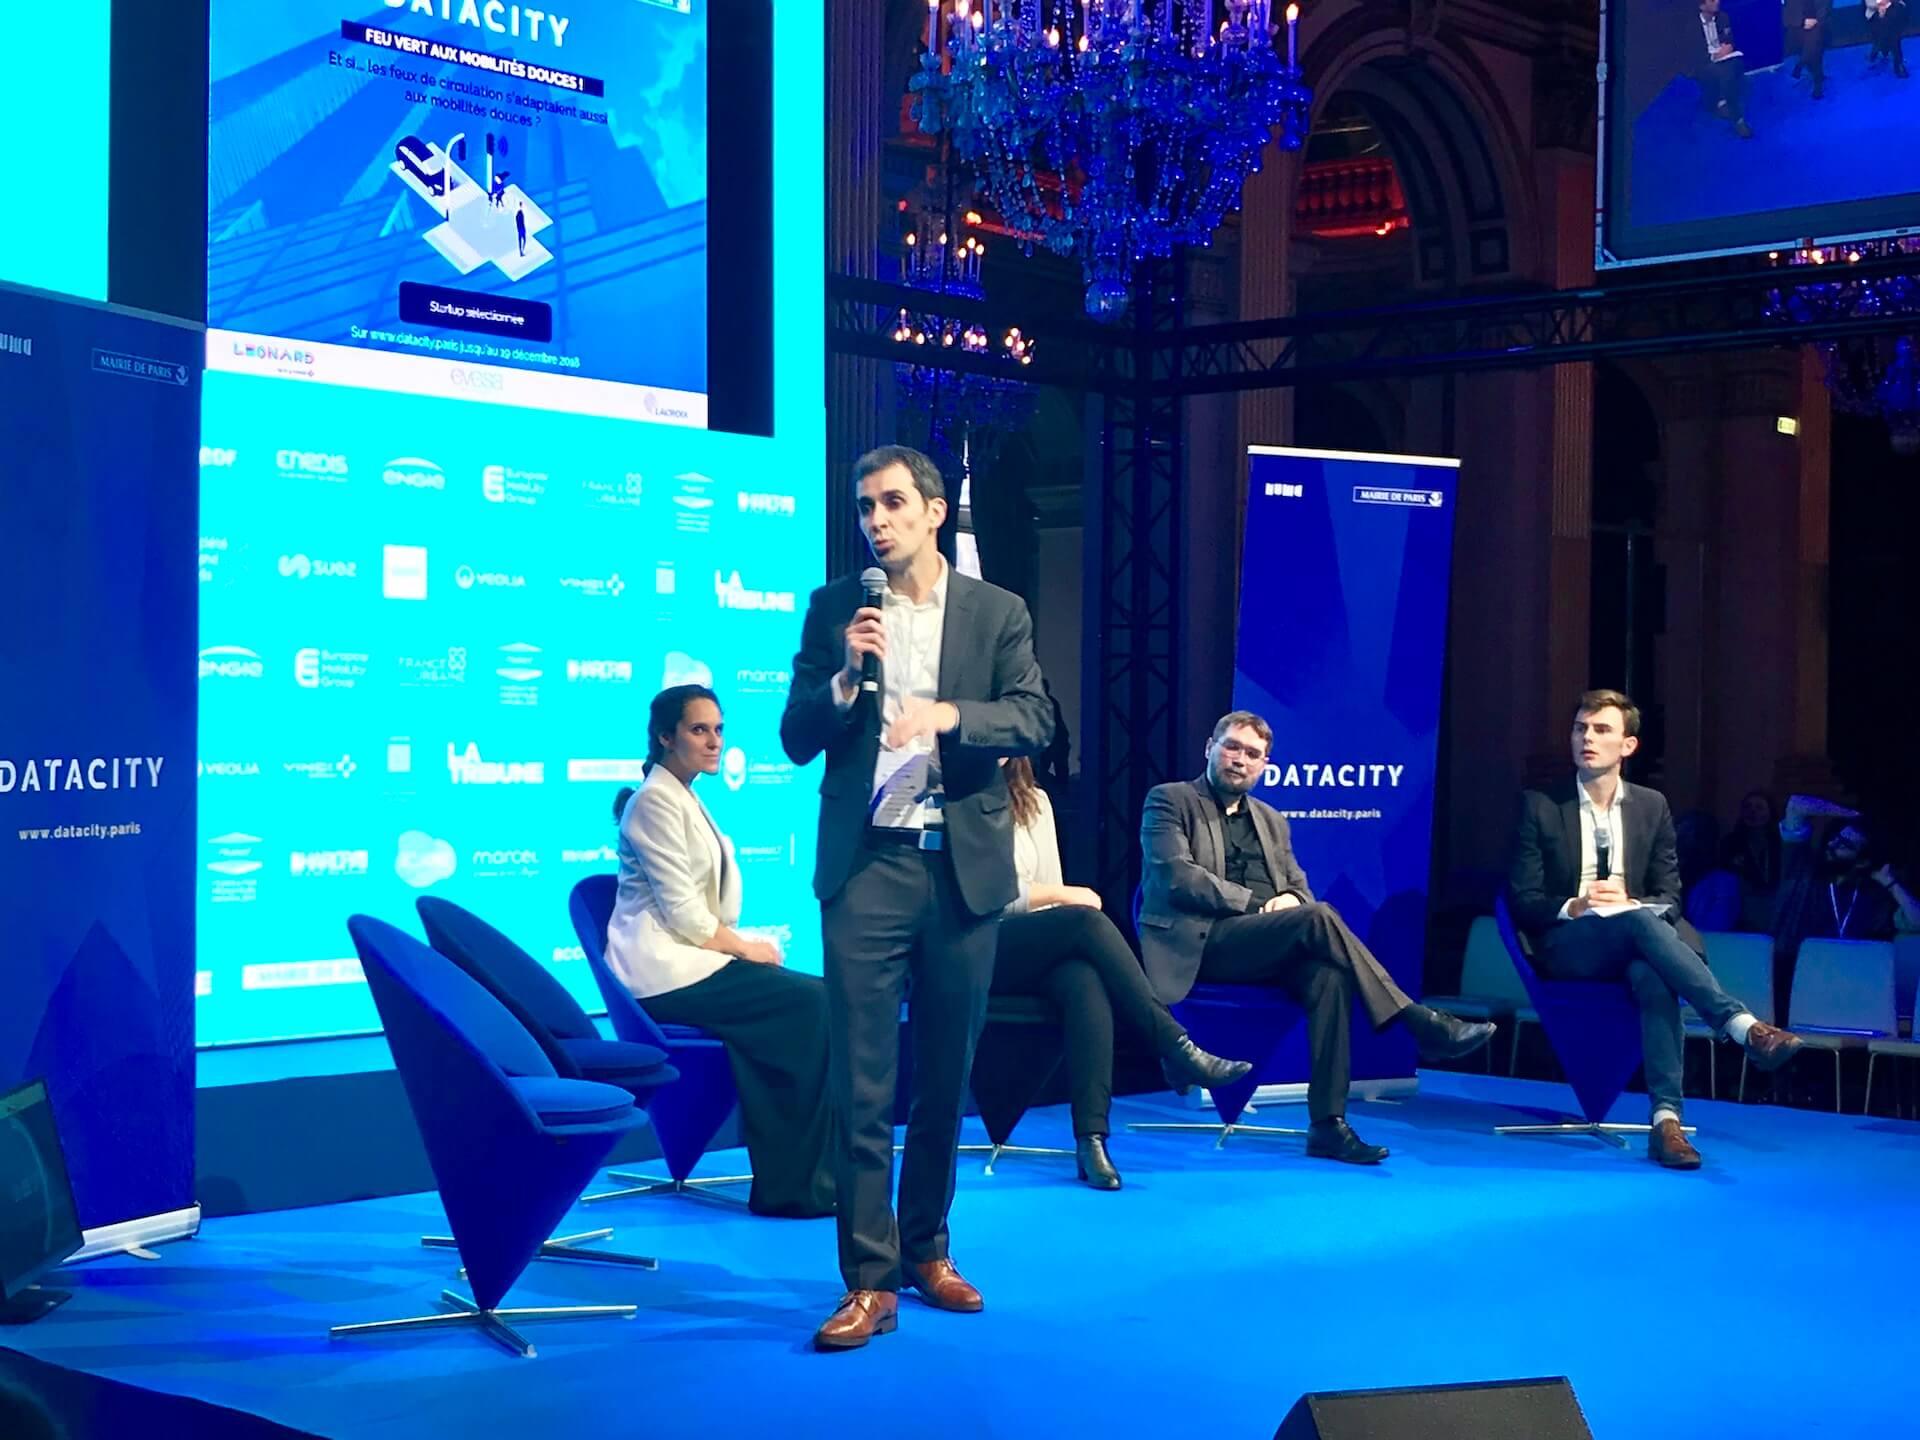 Leonard rises to three urban challenges with the DataCity Paris programme!